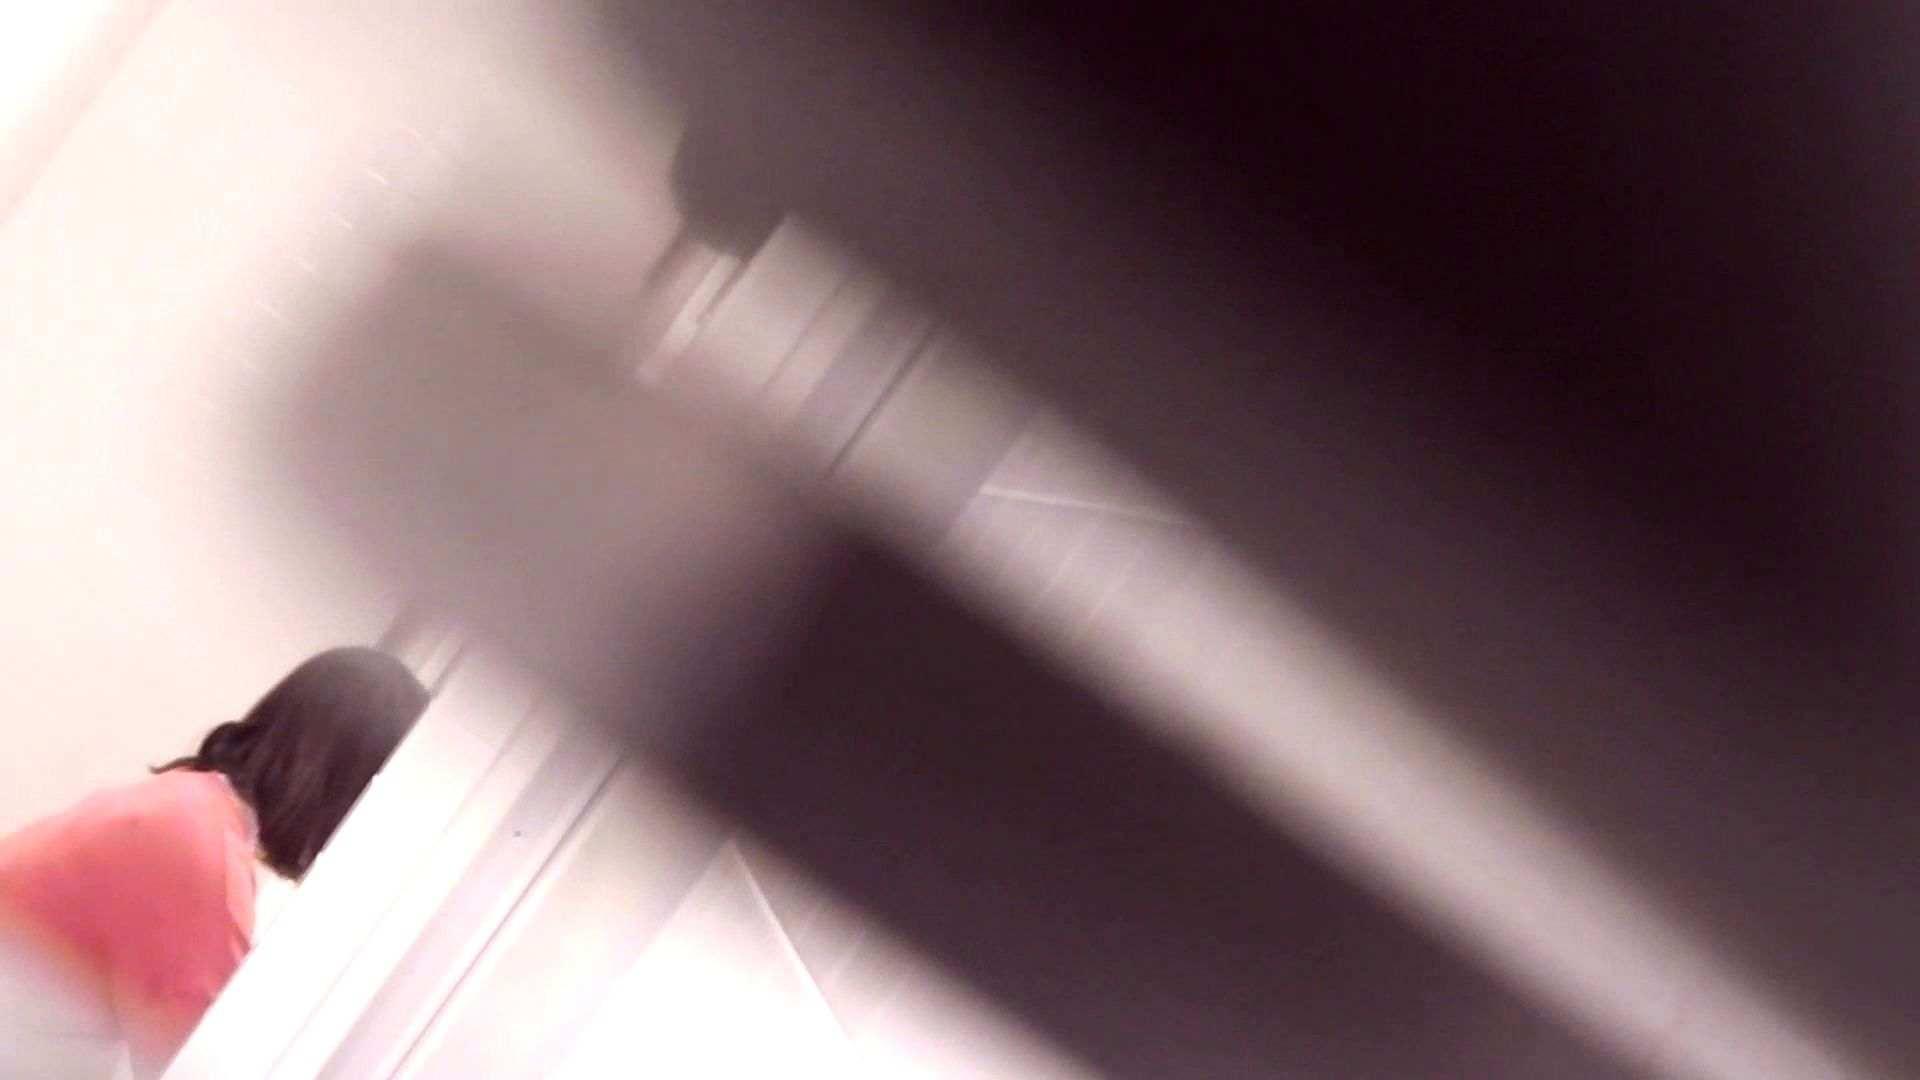 vol.15 命がけ潜伏洗面所! 肌荒れ注意報!! プライベート 隠し撮りすけべAV動画紹介 102画像 79